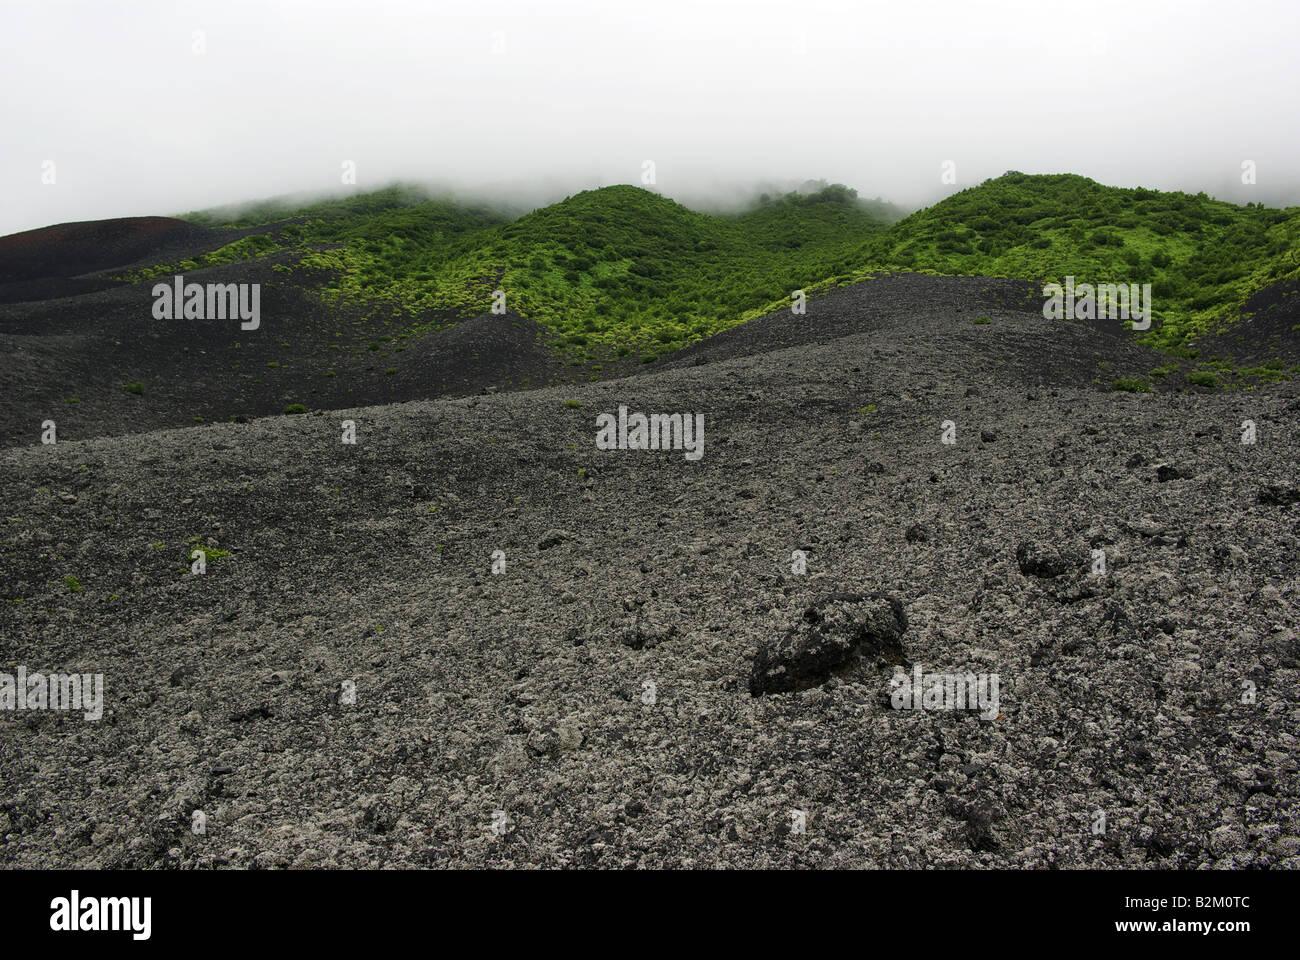 Slope of volcano Tya Tya, Kunashir island, Kuril islands Far East of Russia. - Stock Image